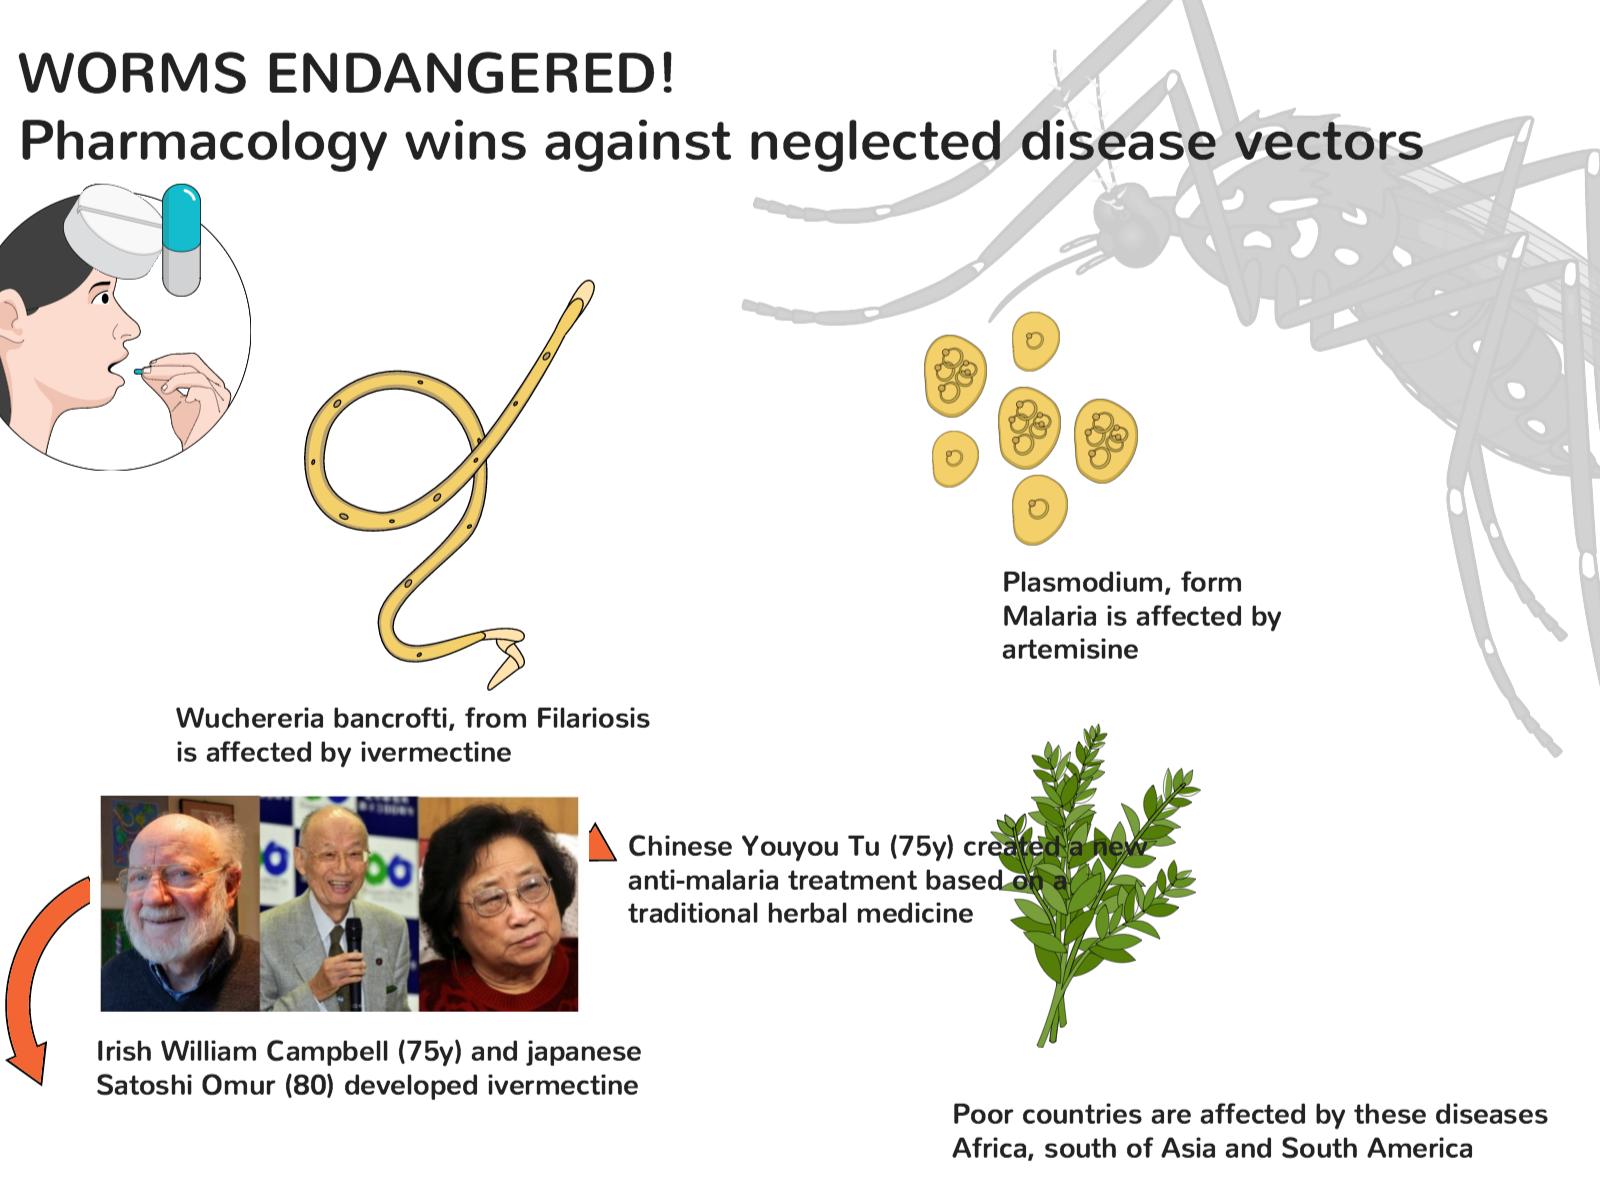 2015 Nobel laureates